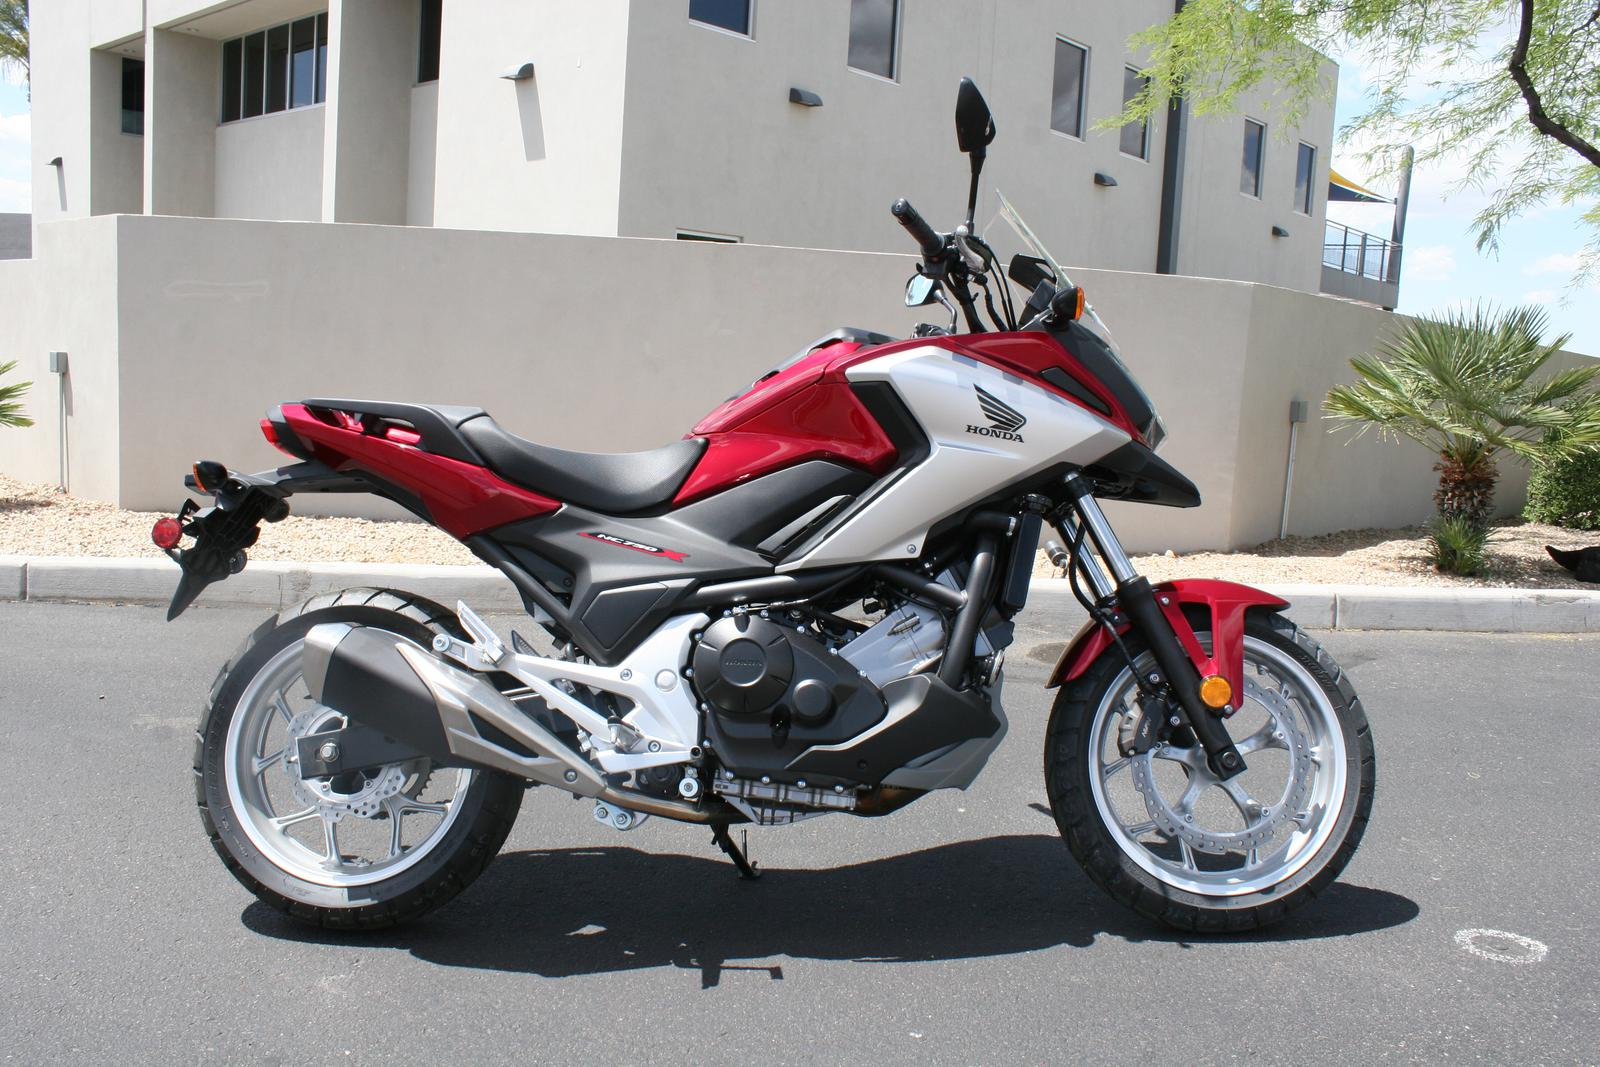 2018 Honda Nc750x For Sale In Scottsdale Az Go Az Motorcycles In